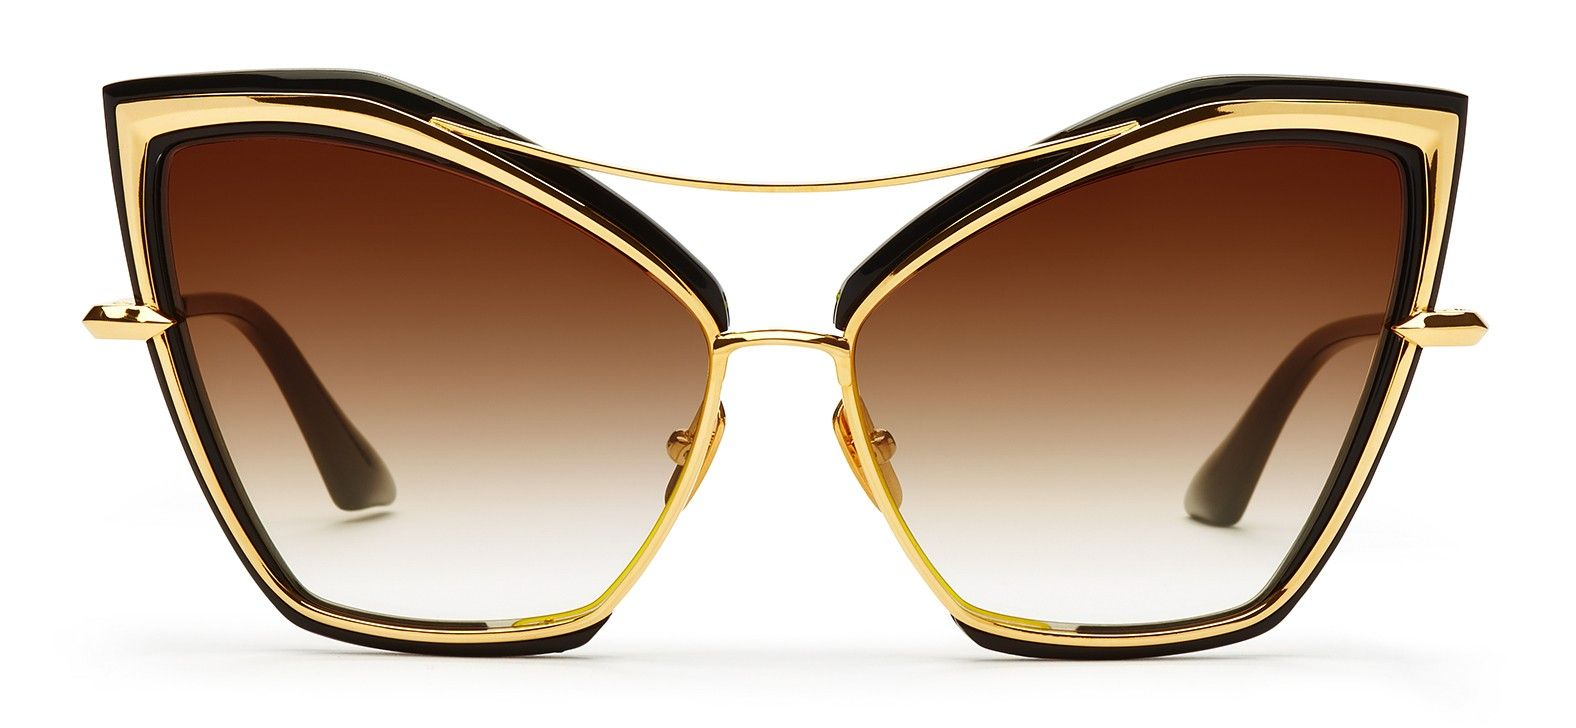 881ae8ce8a The CREATURE sunglasses by DITA Eyewear.